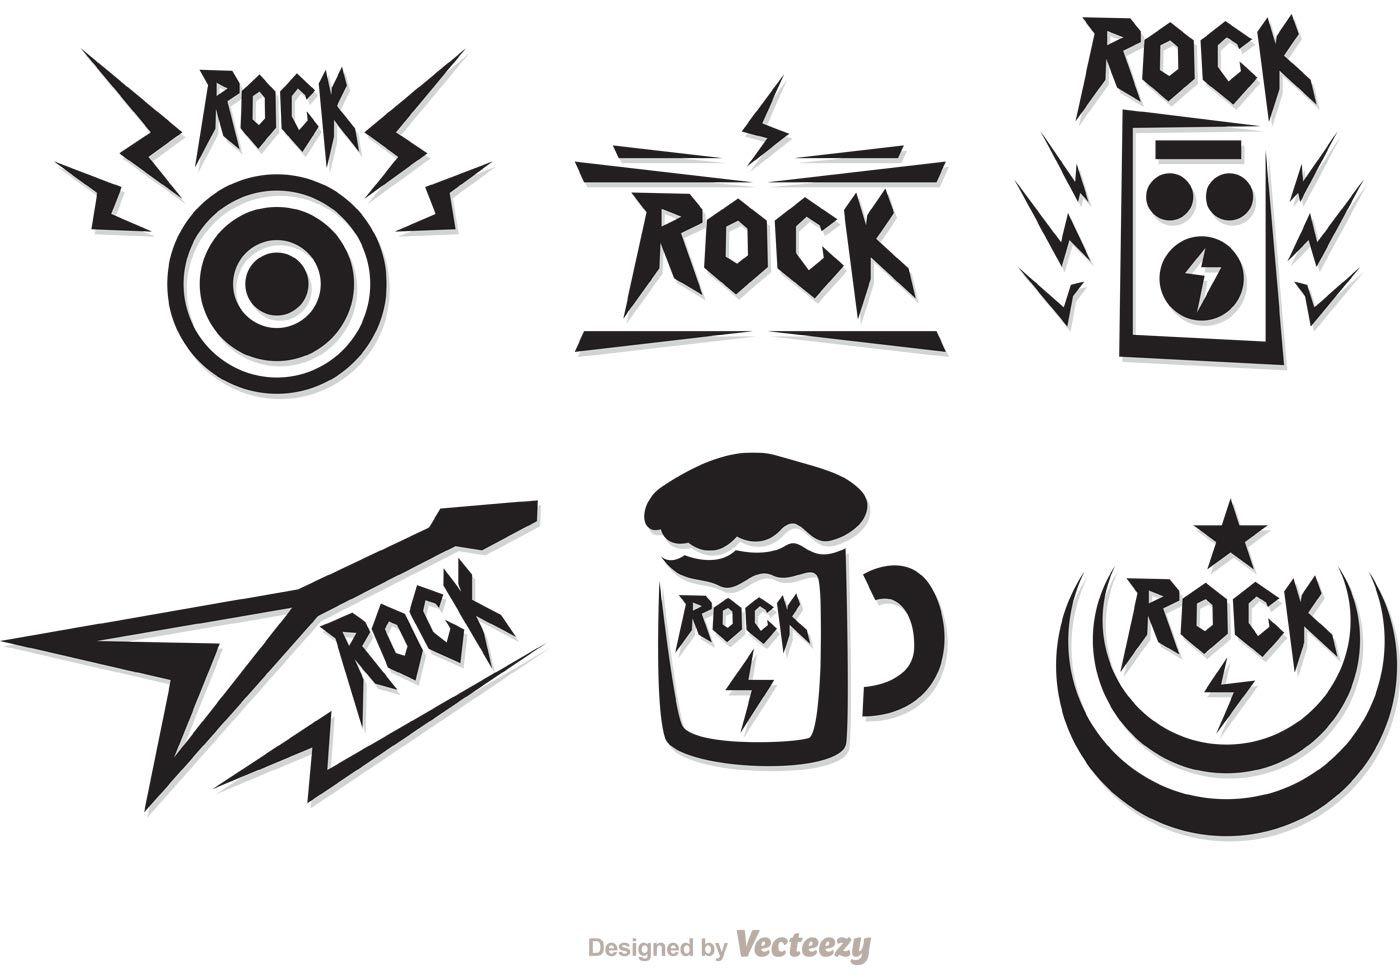 Rock music symbols vectors pack strike off pinterest music rock music symbols vectors pack biocorpaavc